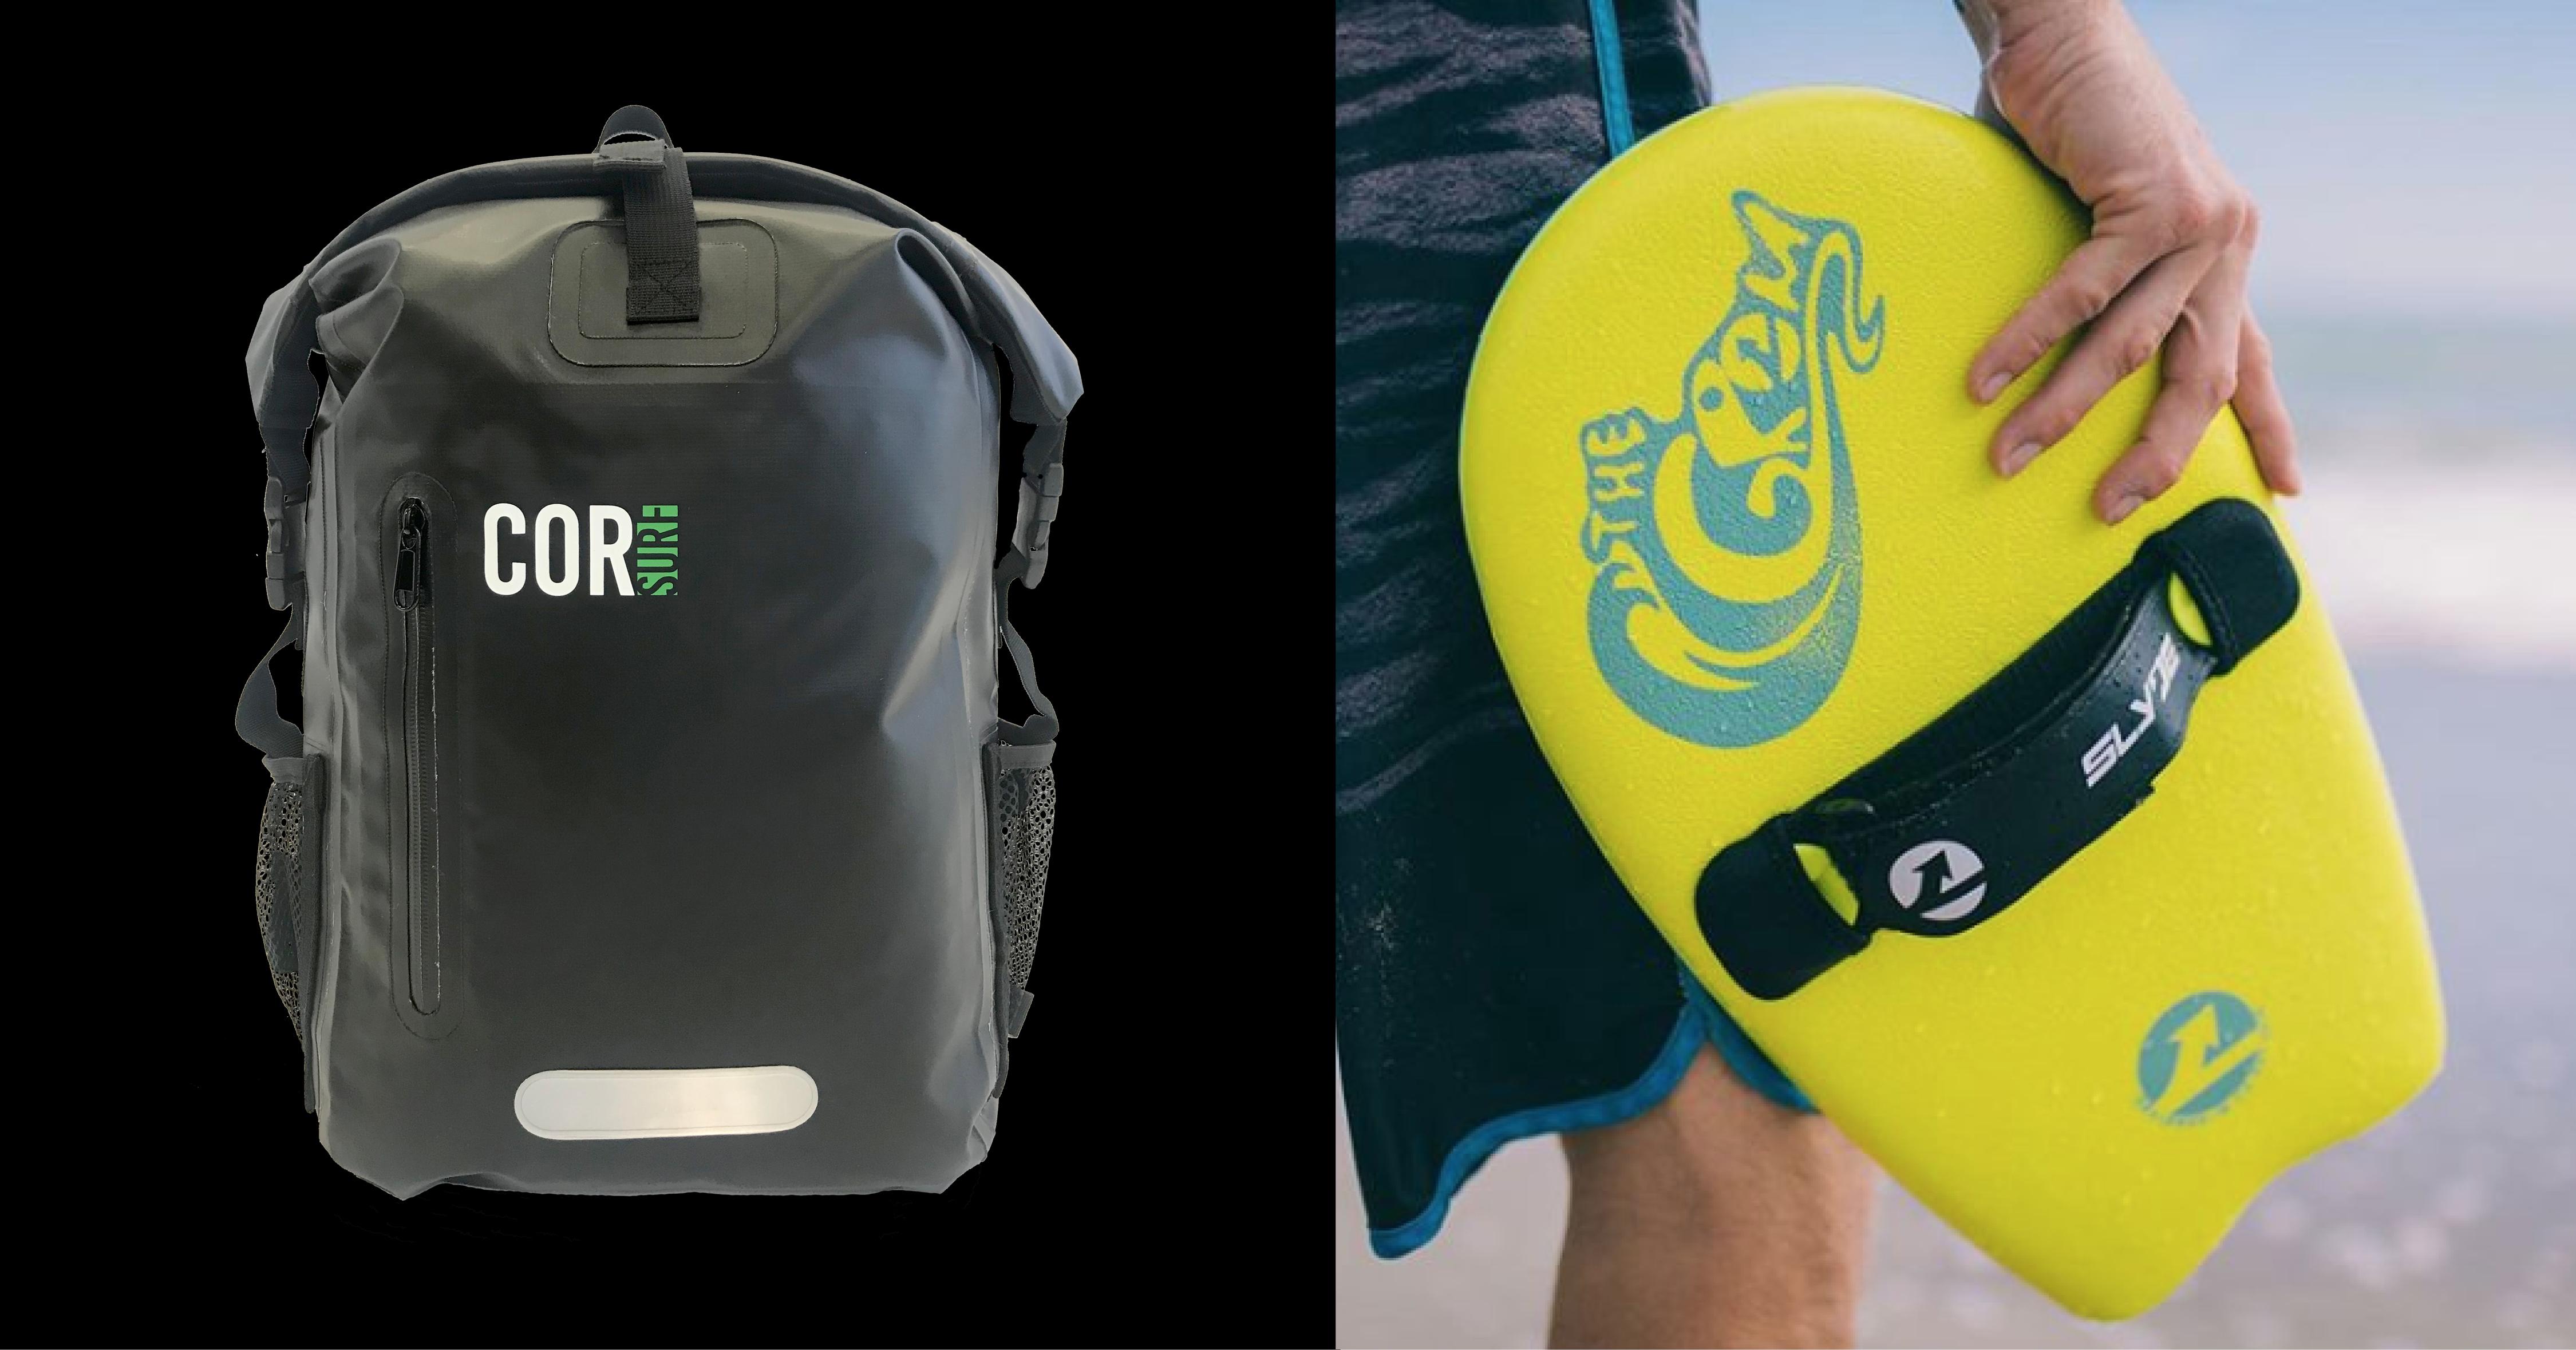 Slyde COR Surf Giveaway